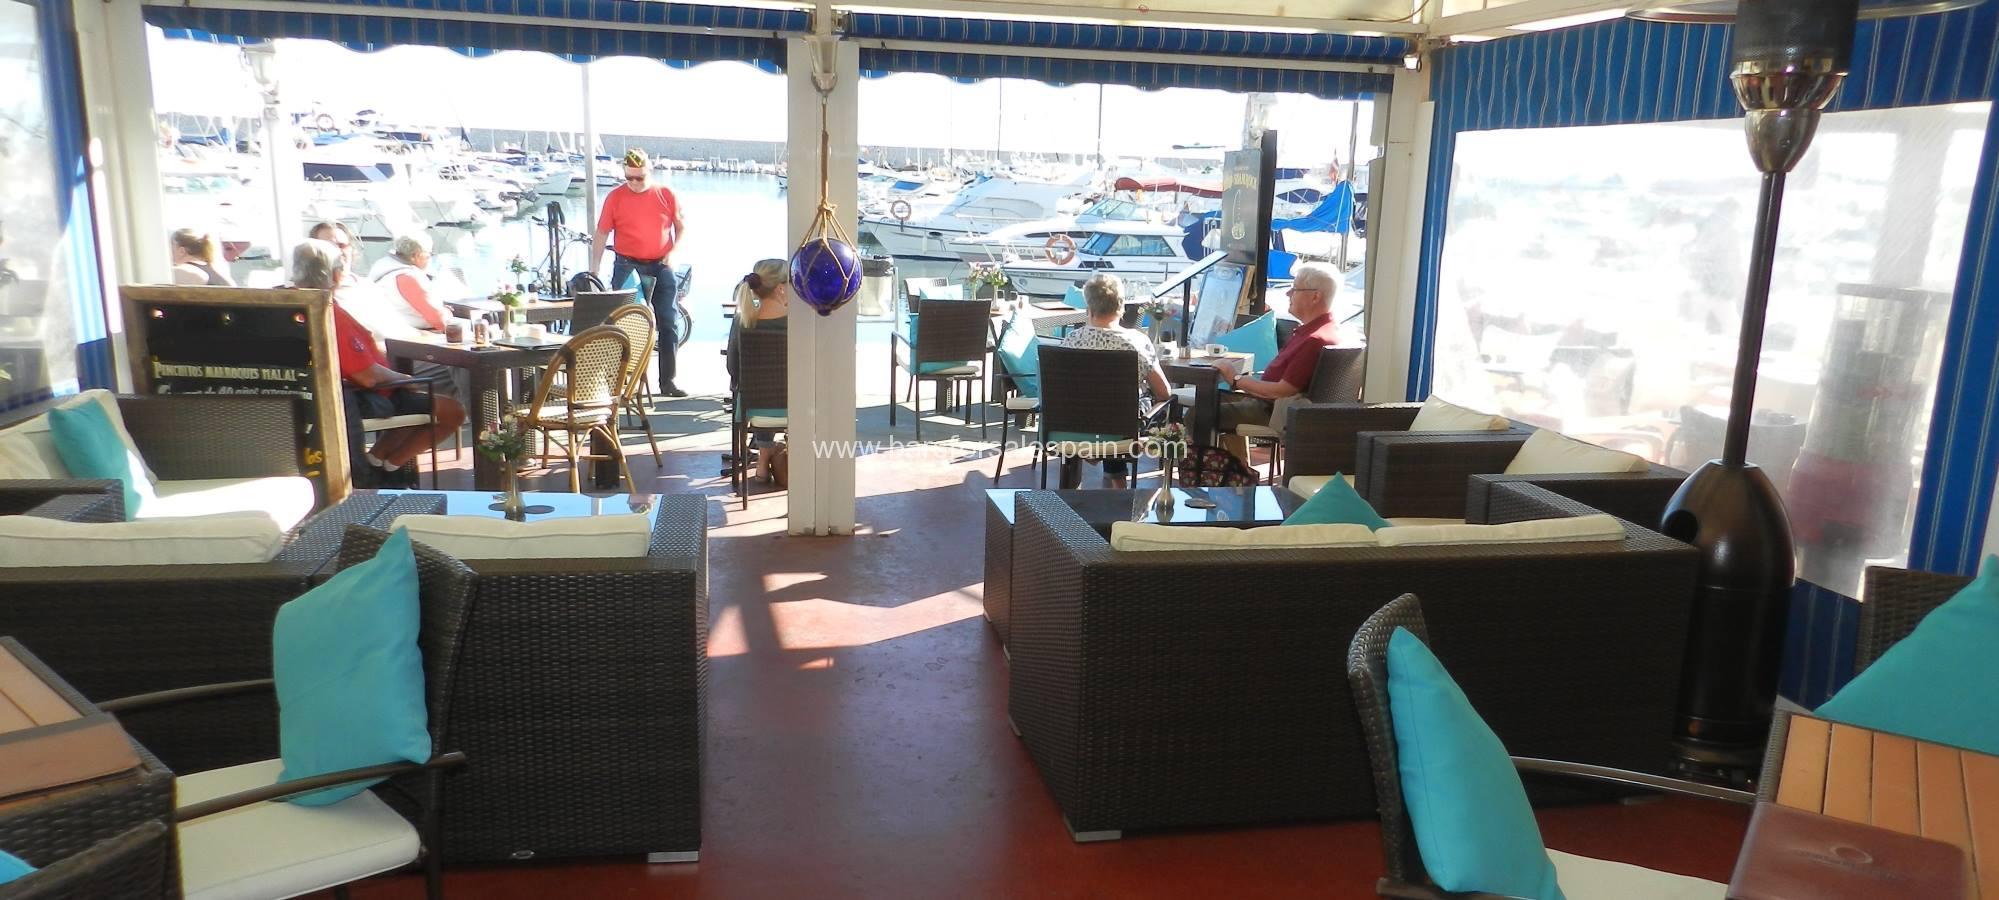 Cafe Bar For Sale in Fuengirola, Malaga, Spain